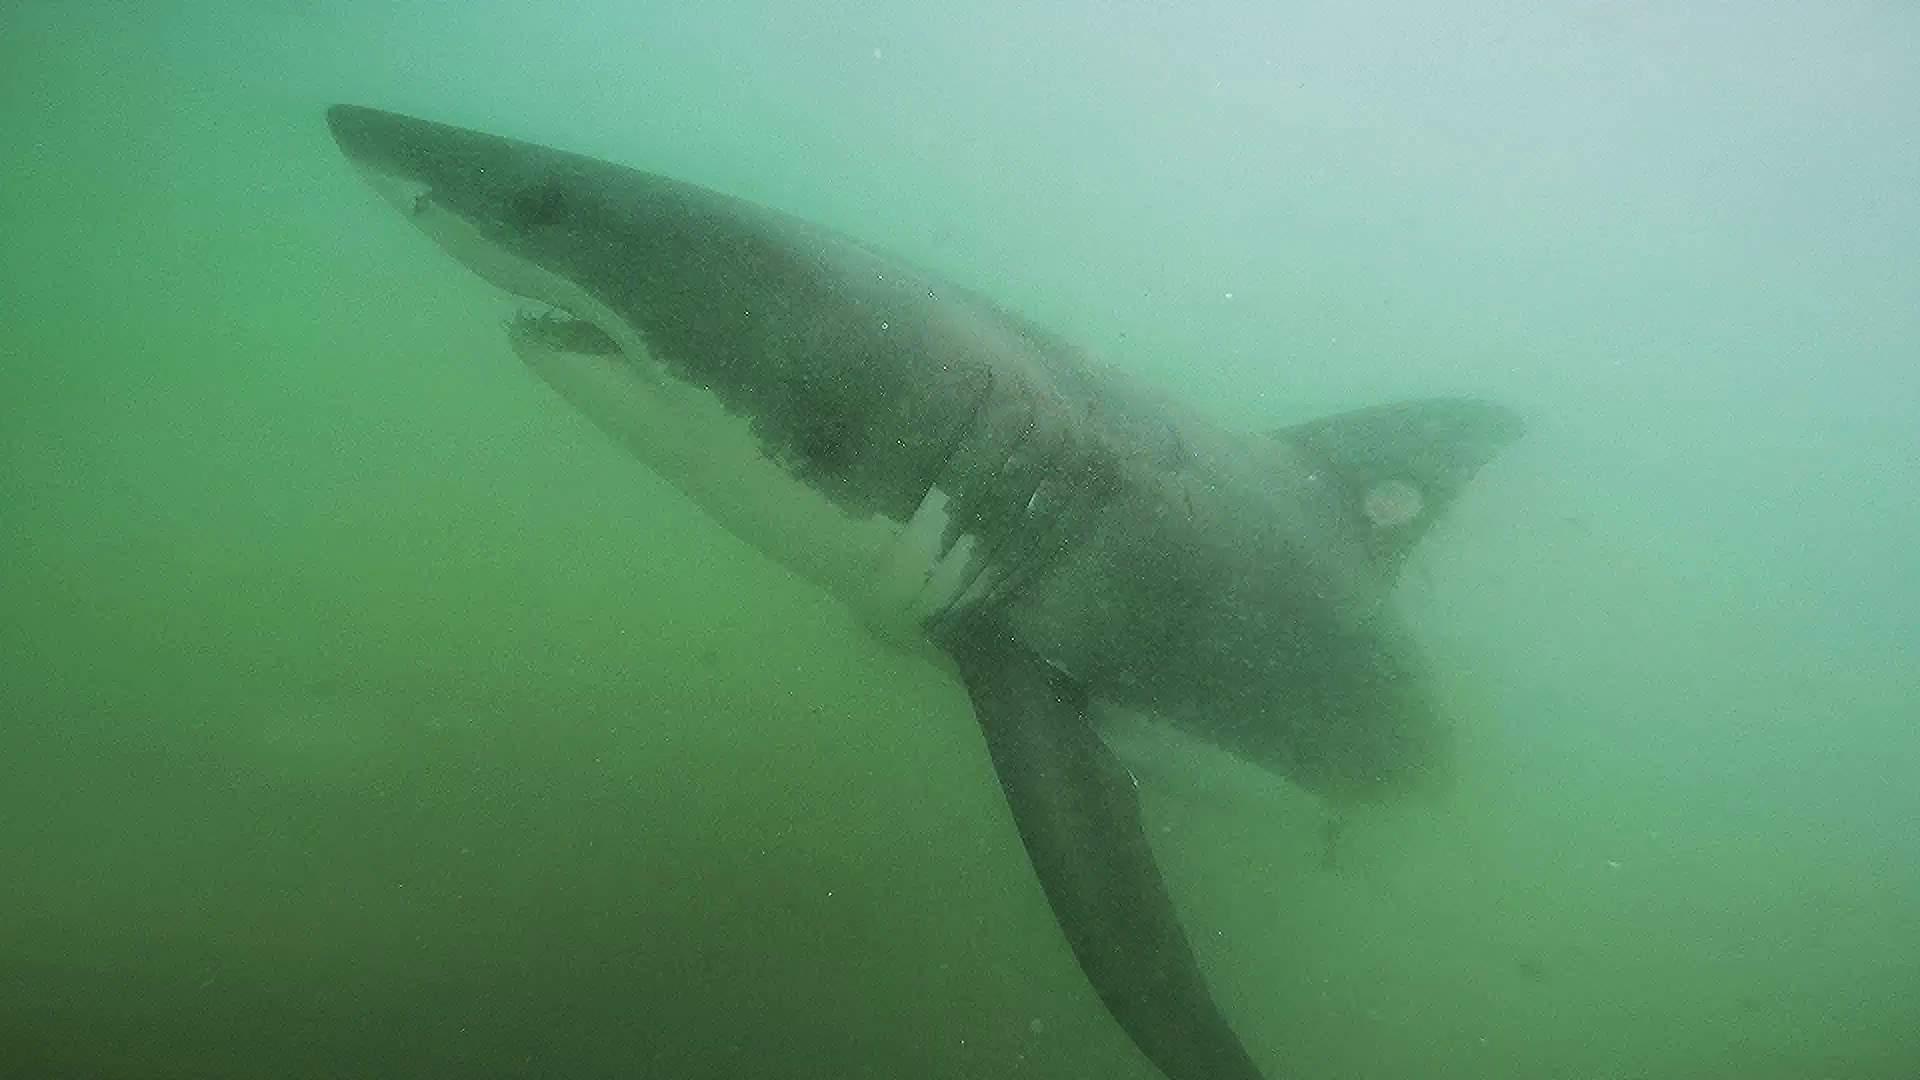 Pelagic Great White Sharks SoCal CSULB 2